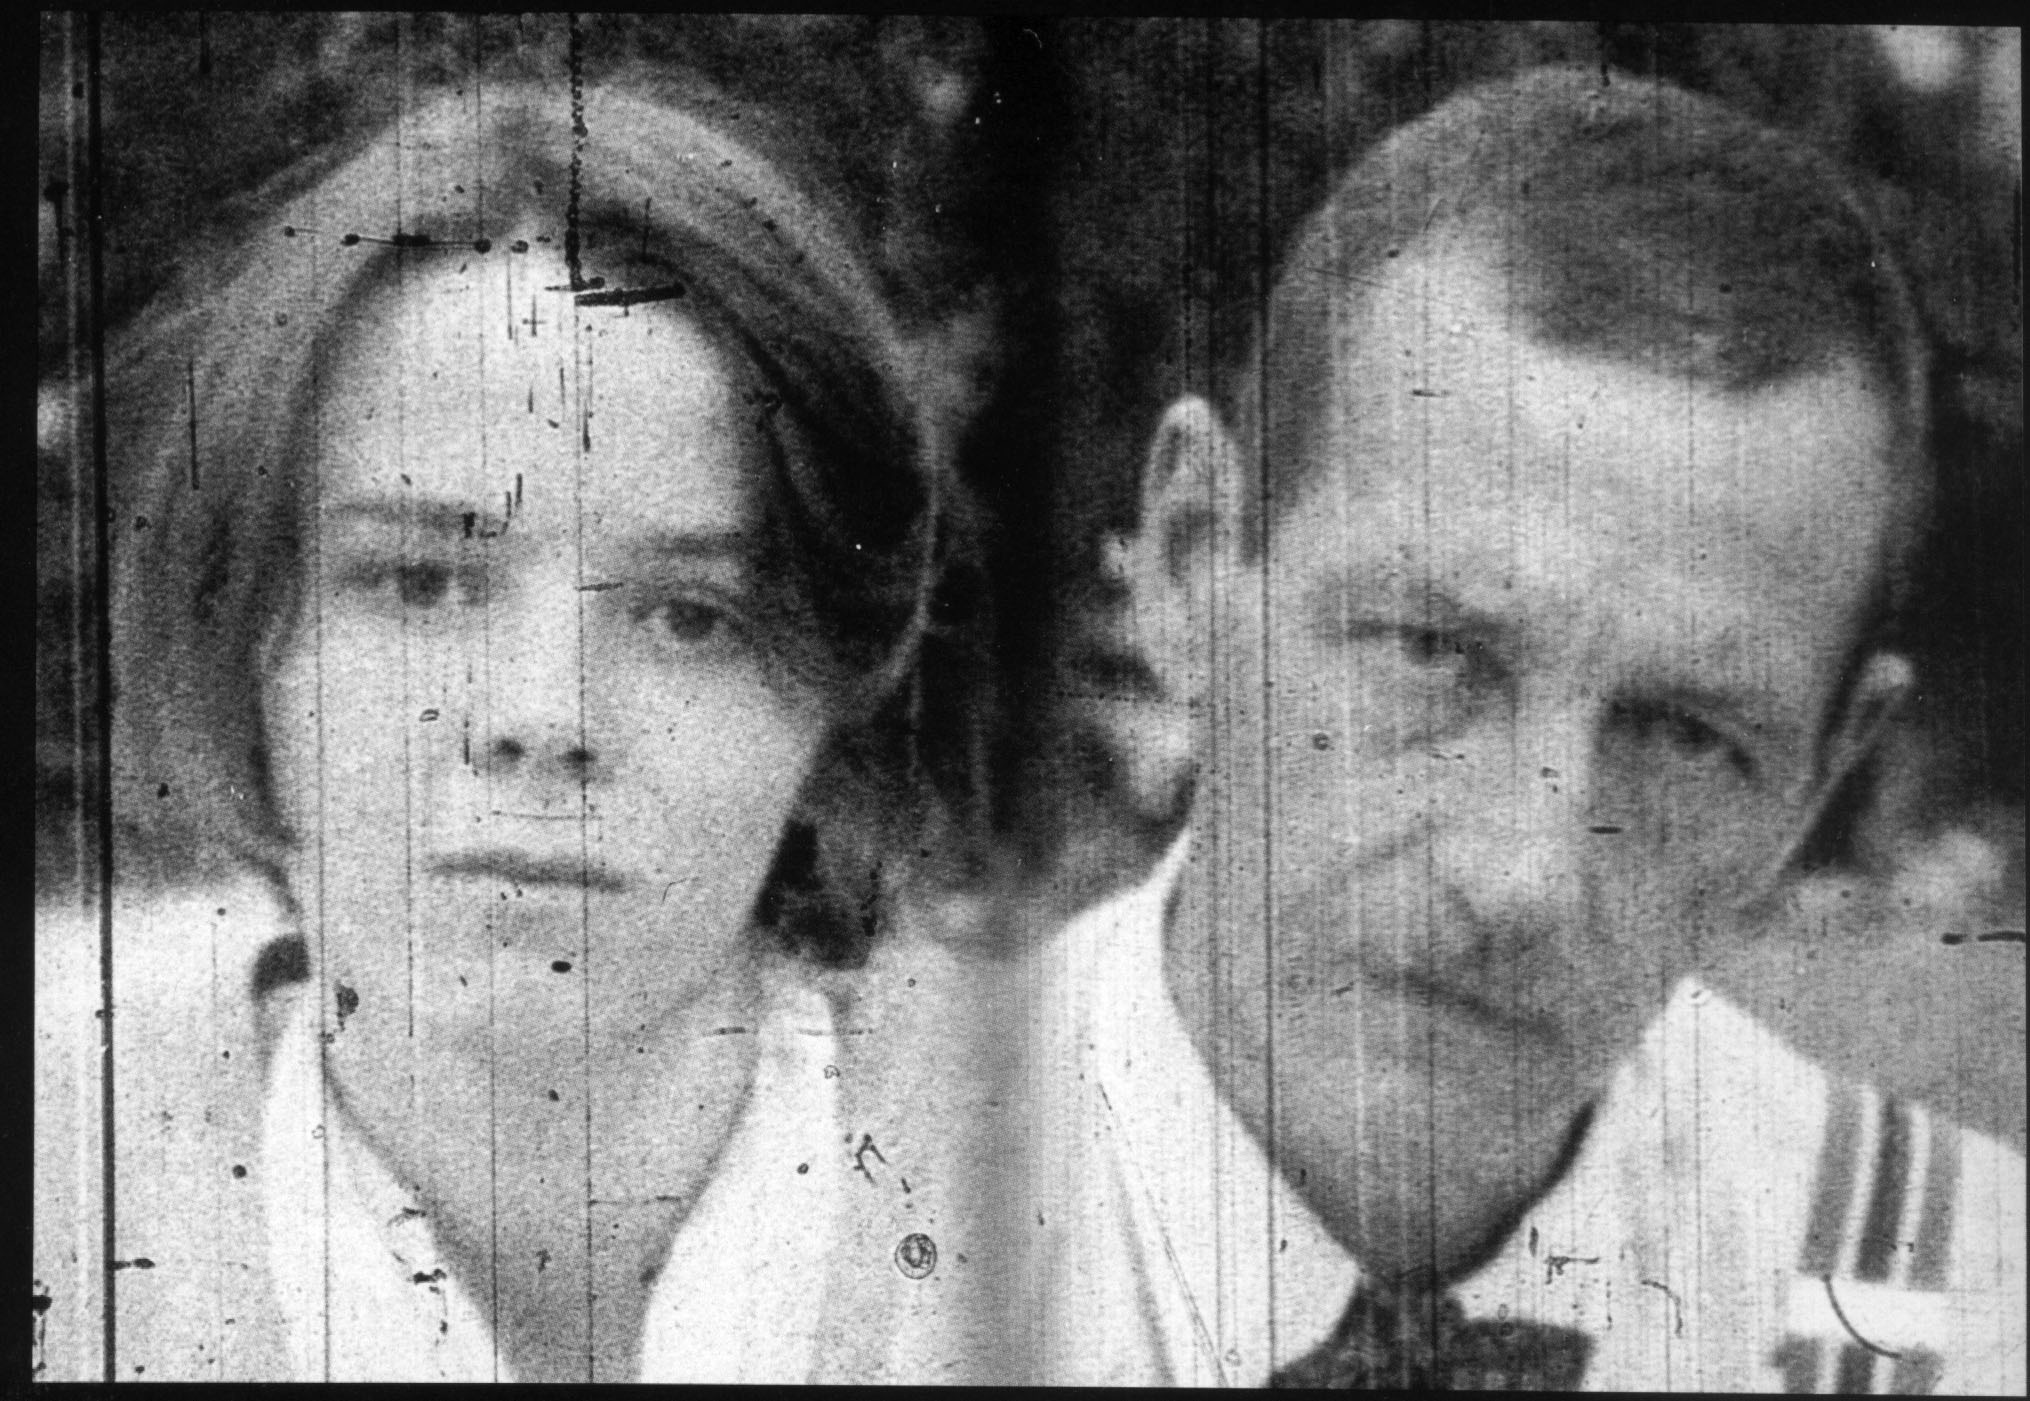 Tren de sombras, José Luis Guerin (1997)